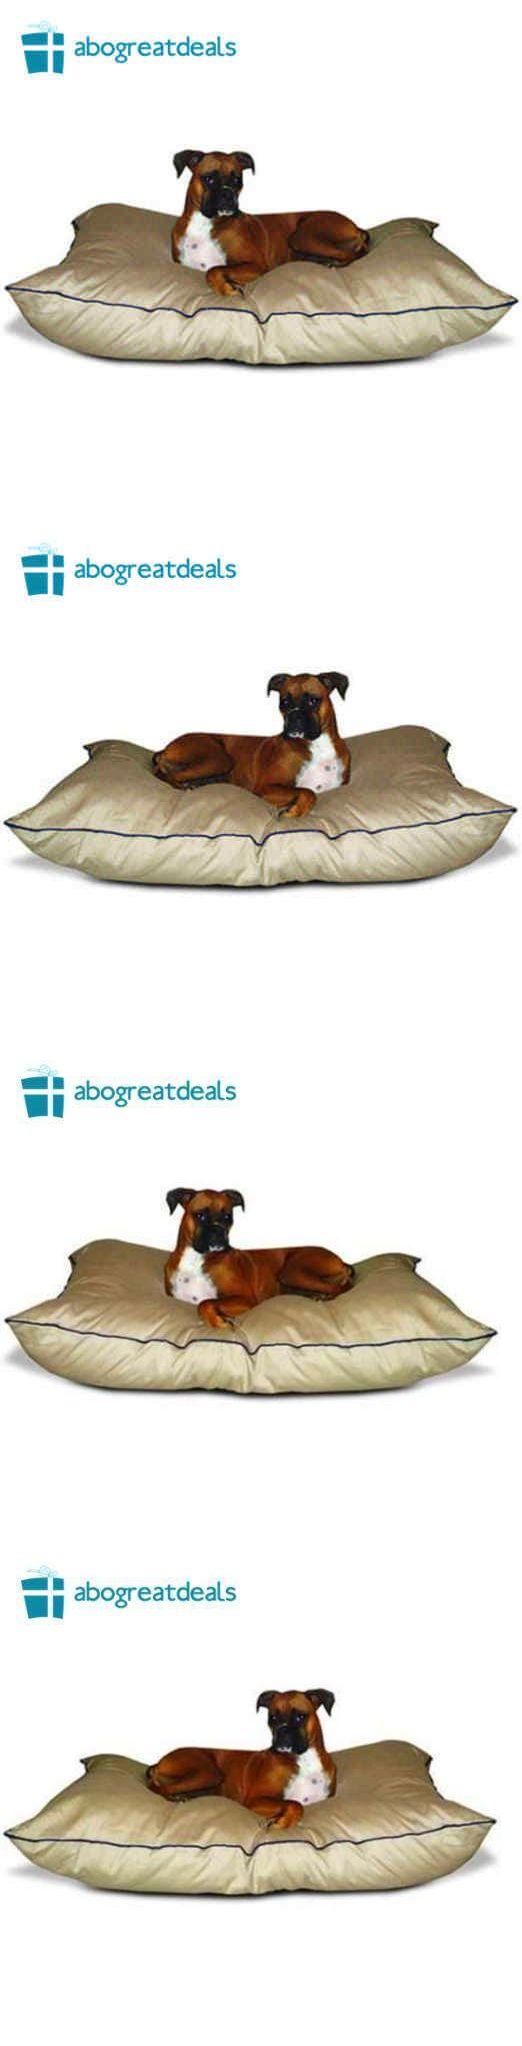 Beds 20744: Great Dane Dog Bed Xxl Extra Large Washable Cushion Pillow English Mastiff Big -> BUY IT NOW ONLY: $50.78 on eBay!